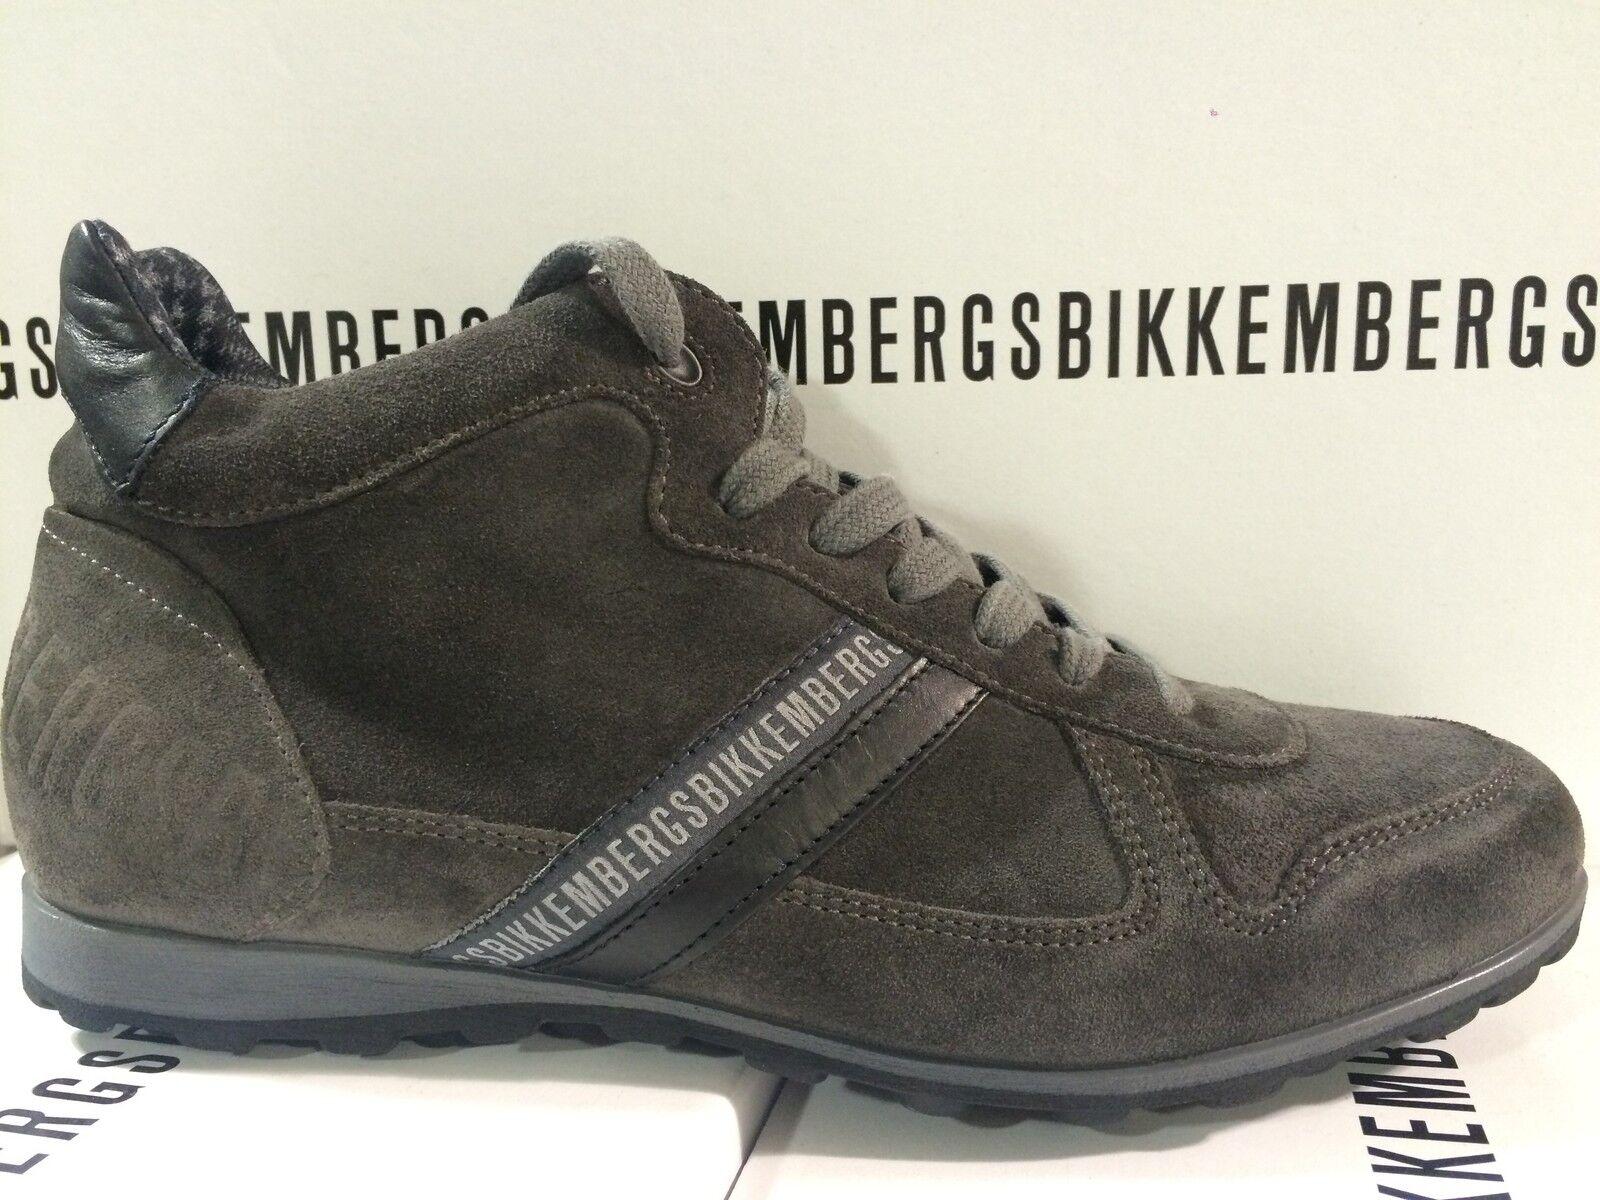 Dirk Bikkembergs Uomo Shoes Scarpe da New Ginnastica Boots Suede Trainers BKE107366 - New da In Box 799048